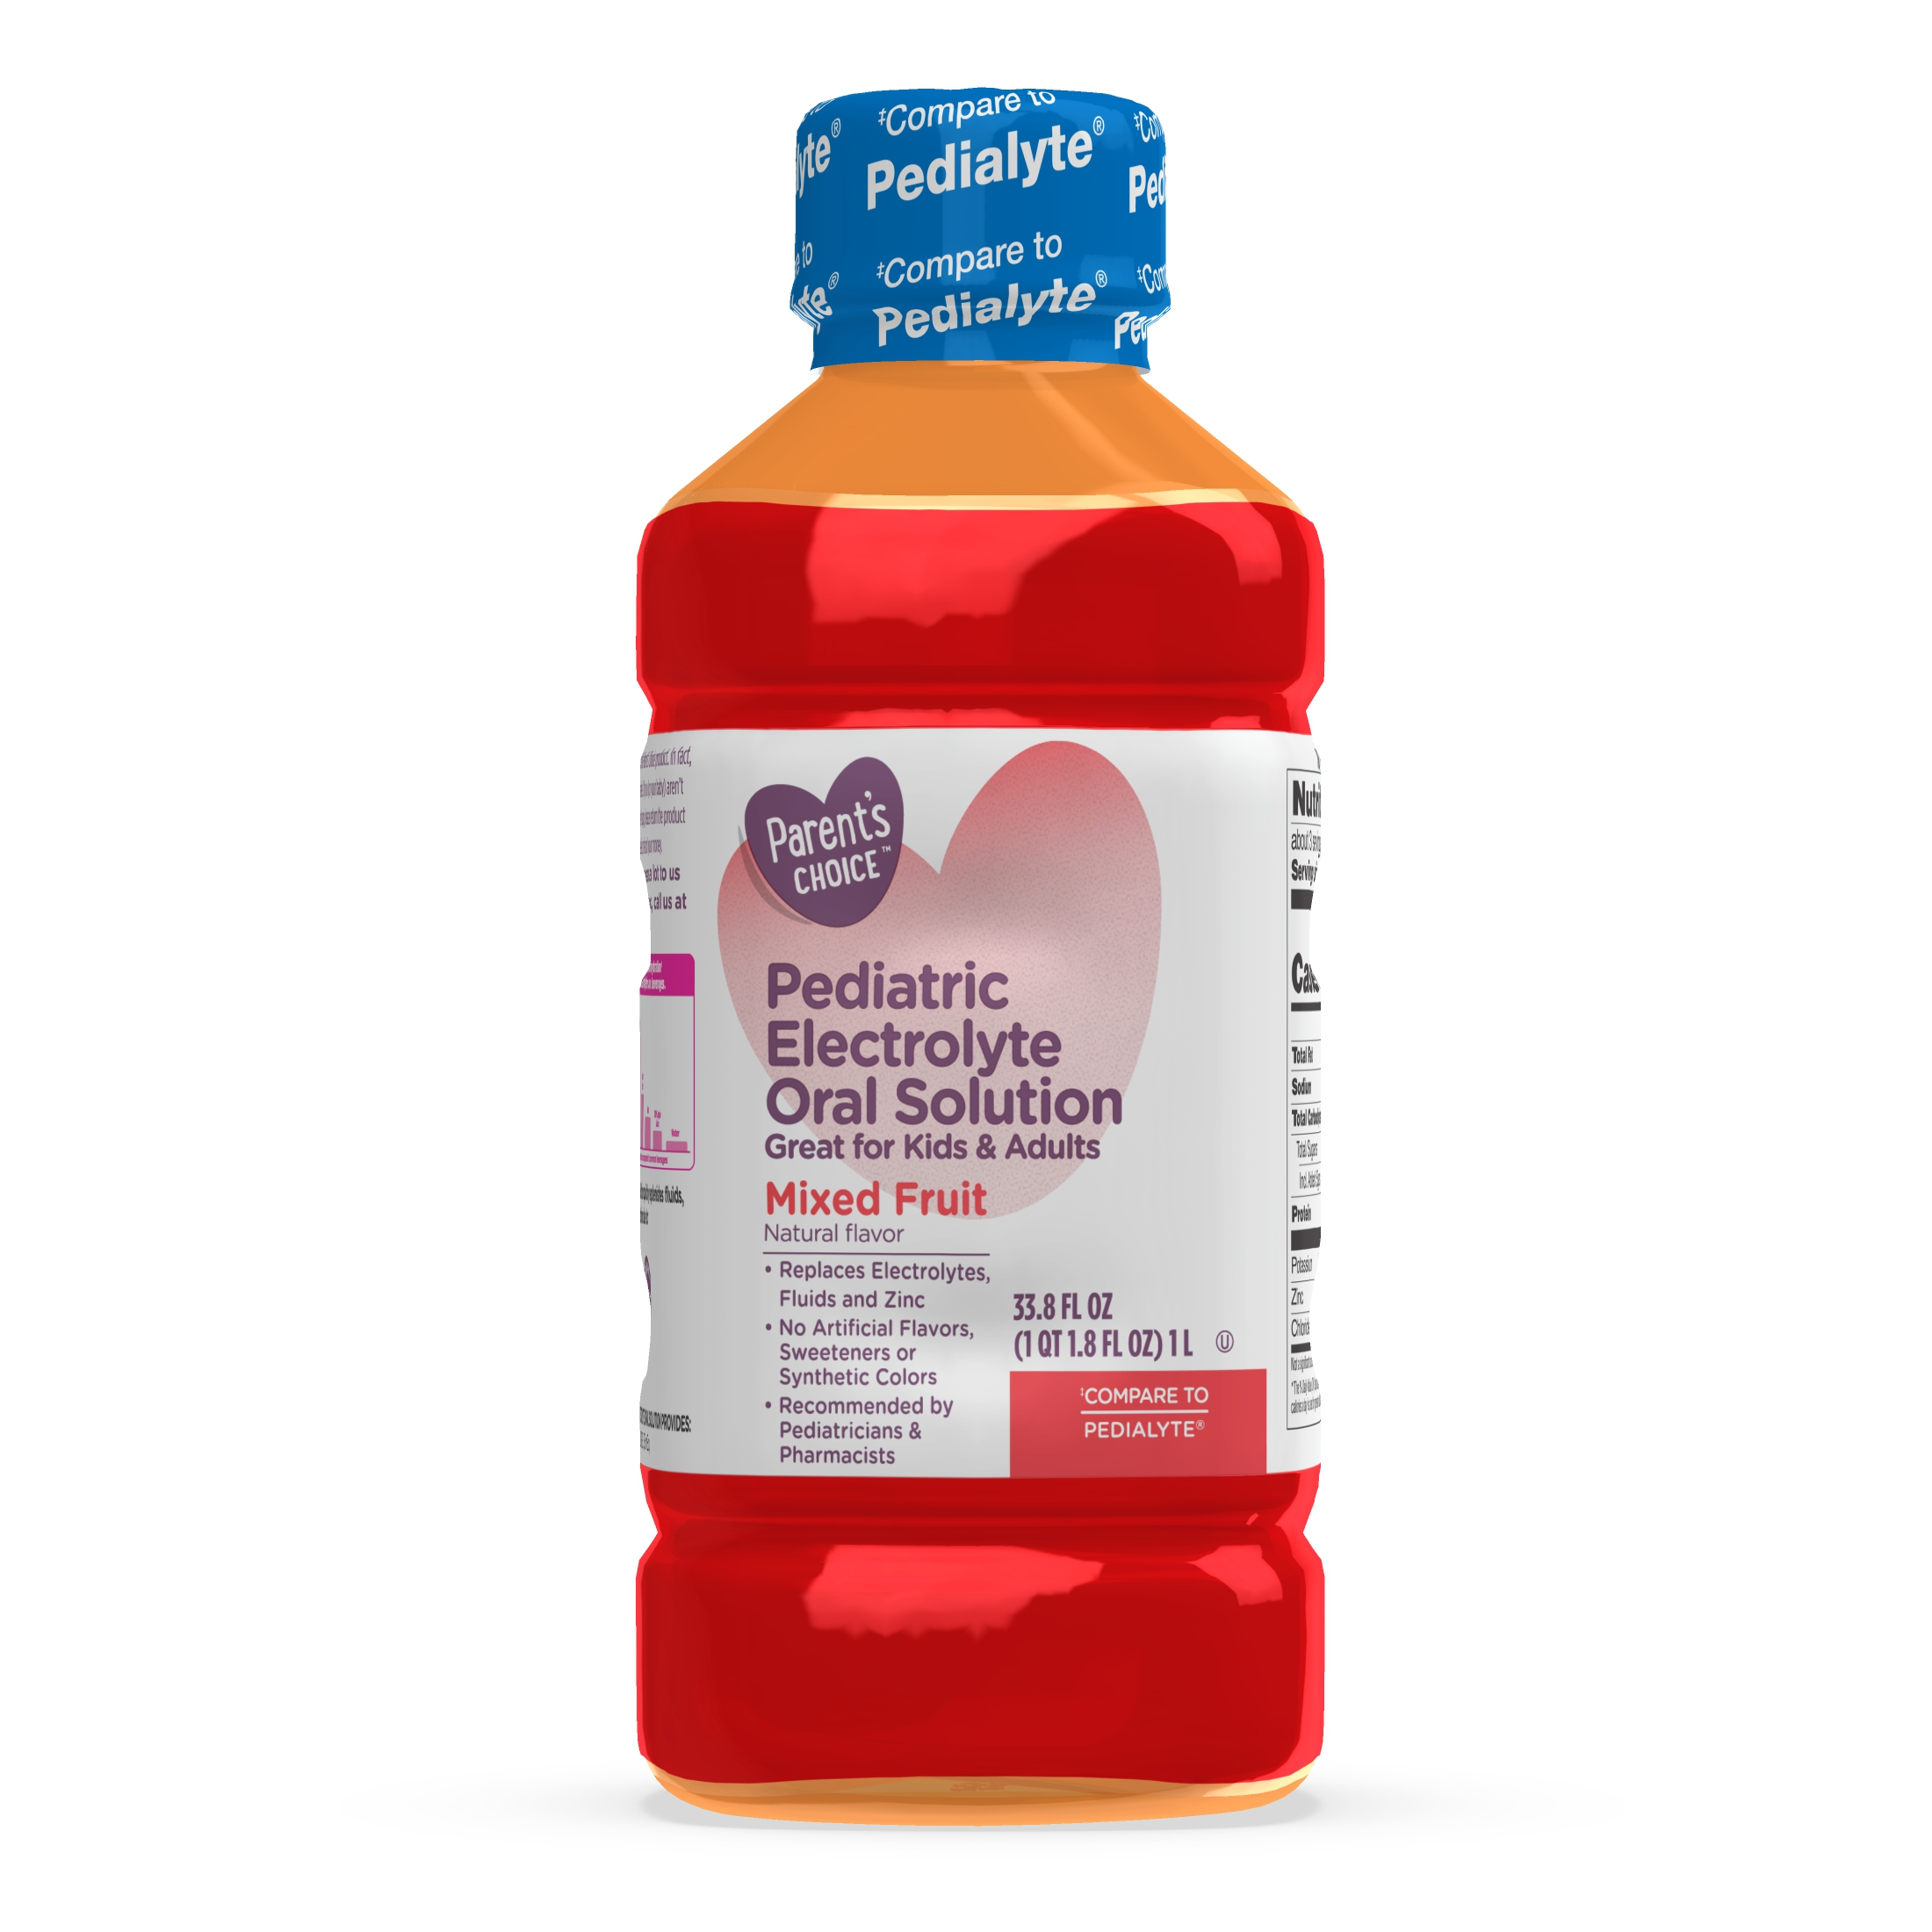 Parent S Choice Pediatric Electrolyte Solution Mixed Fruit 1 Liter Walmart Com Walmart Com